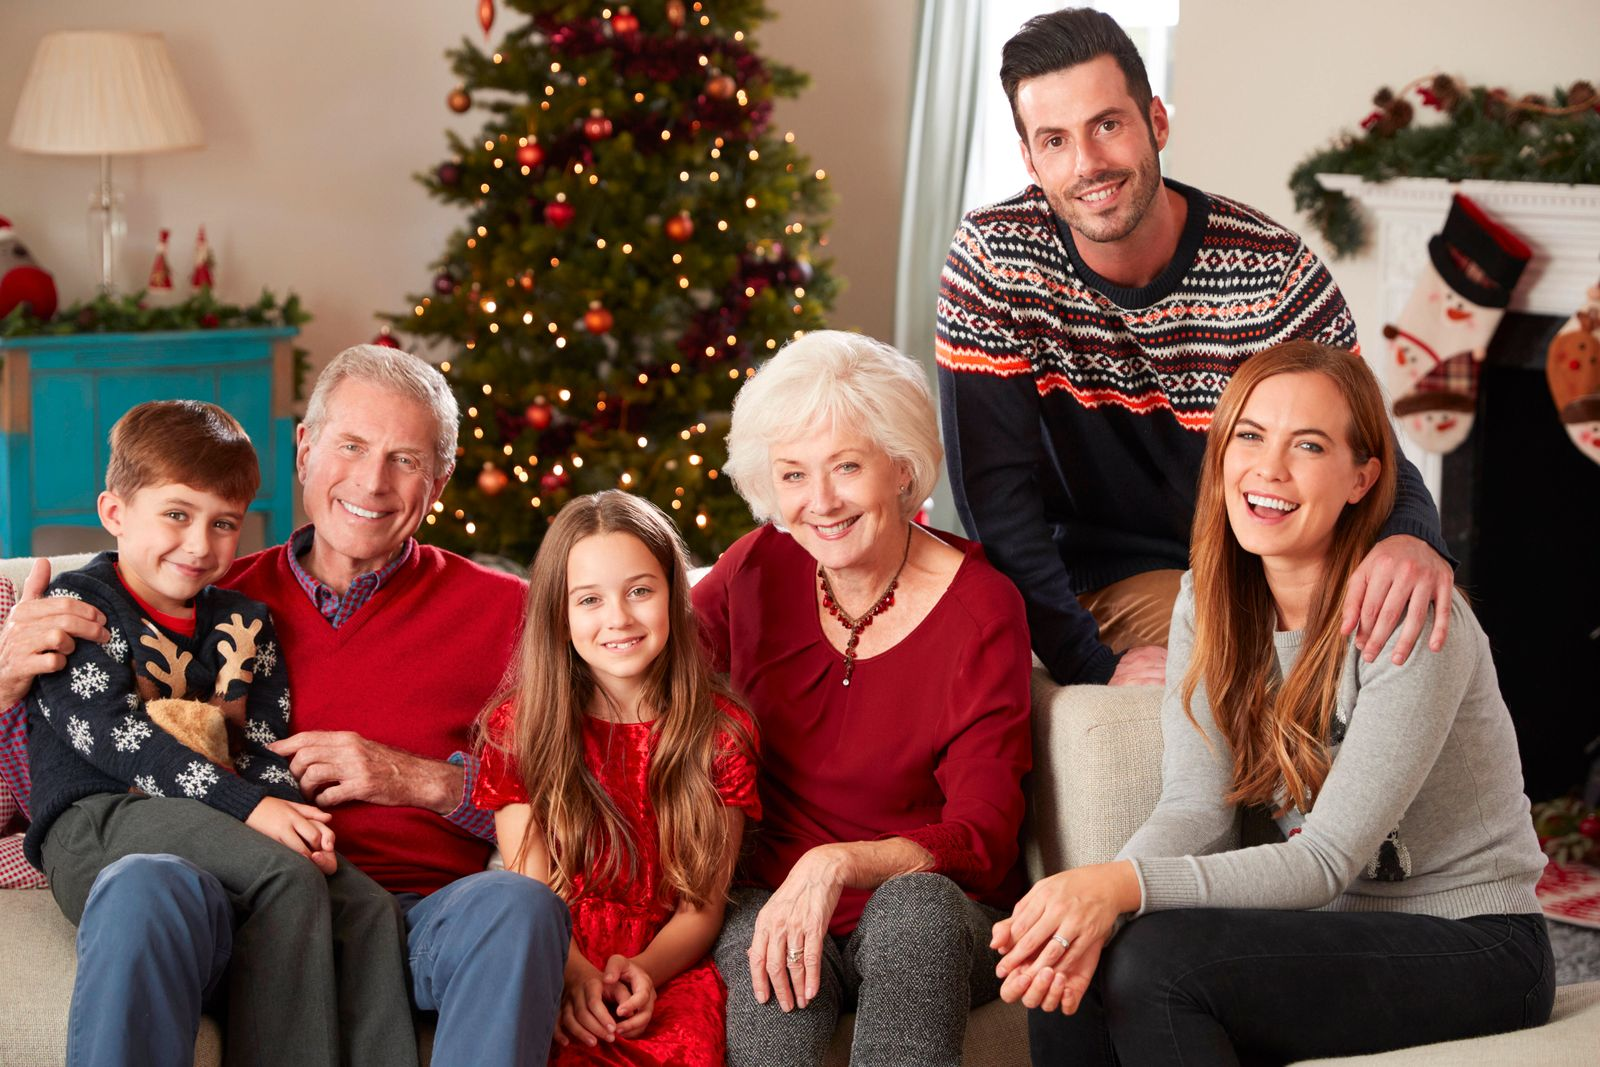 weihnachten,generationen,familienporträt *** christmas,generations,family portrait mmq-wv2,model released, Symbolfoto